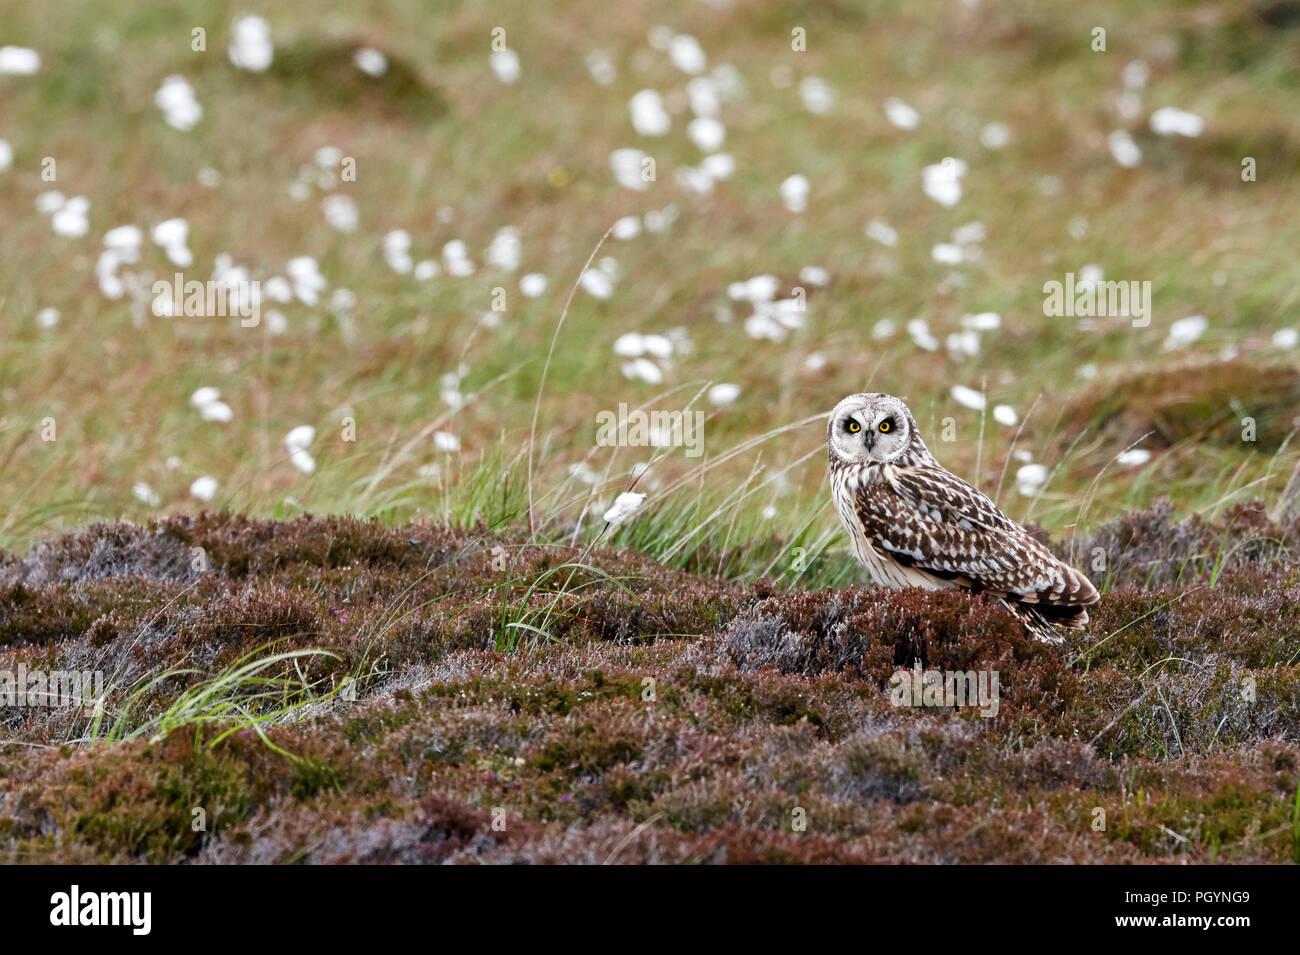 Short-eared owl, Aseo flammeius, UK - Stock Image